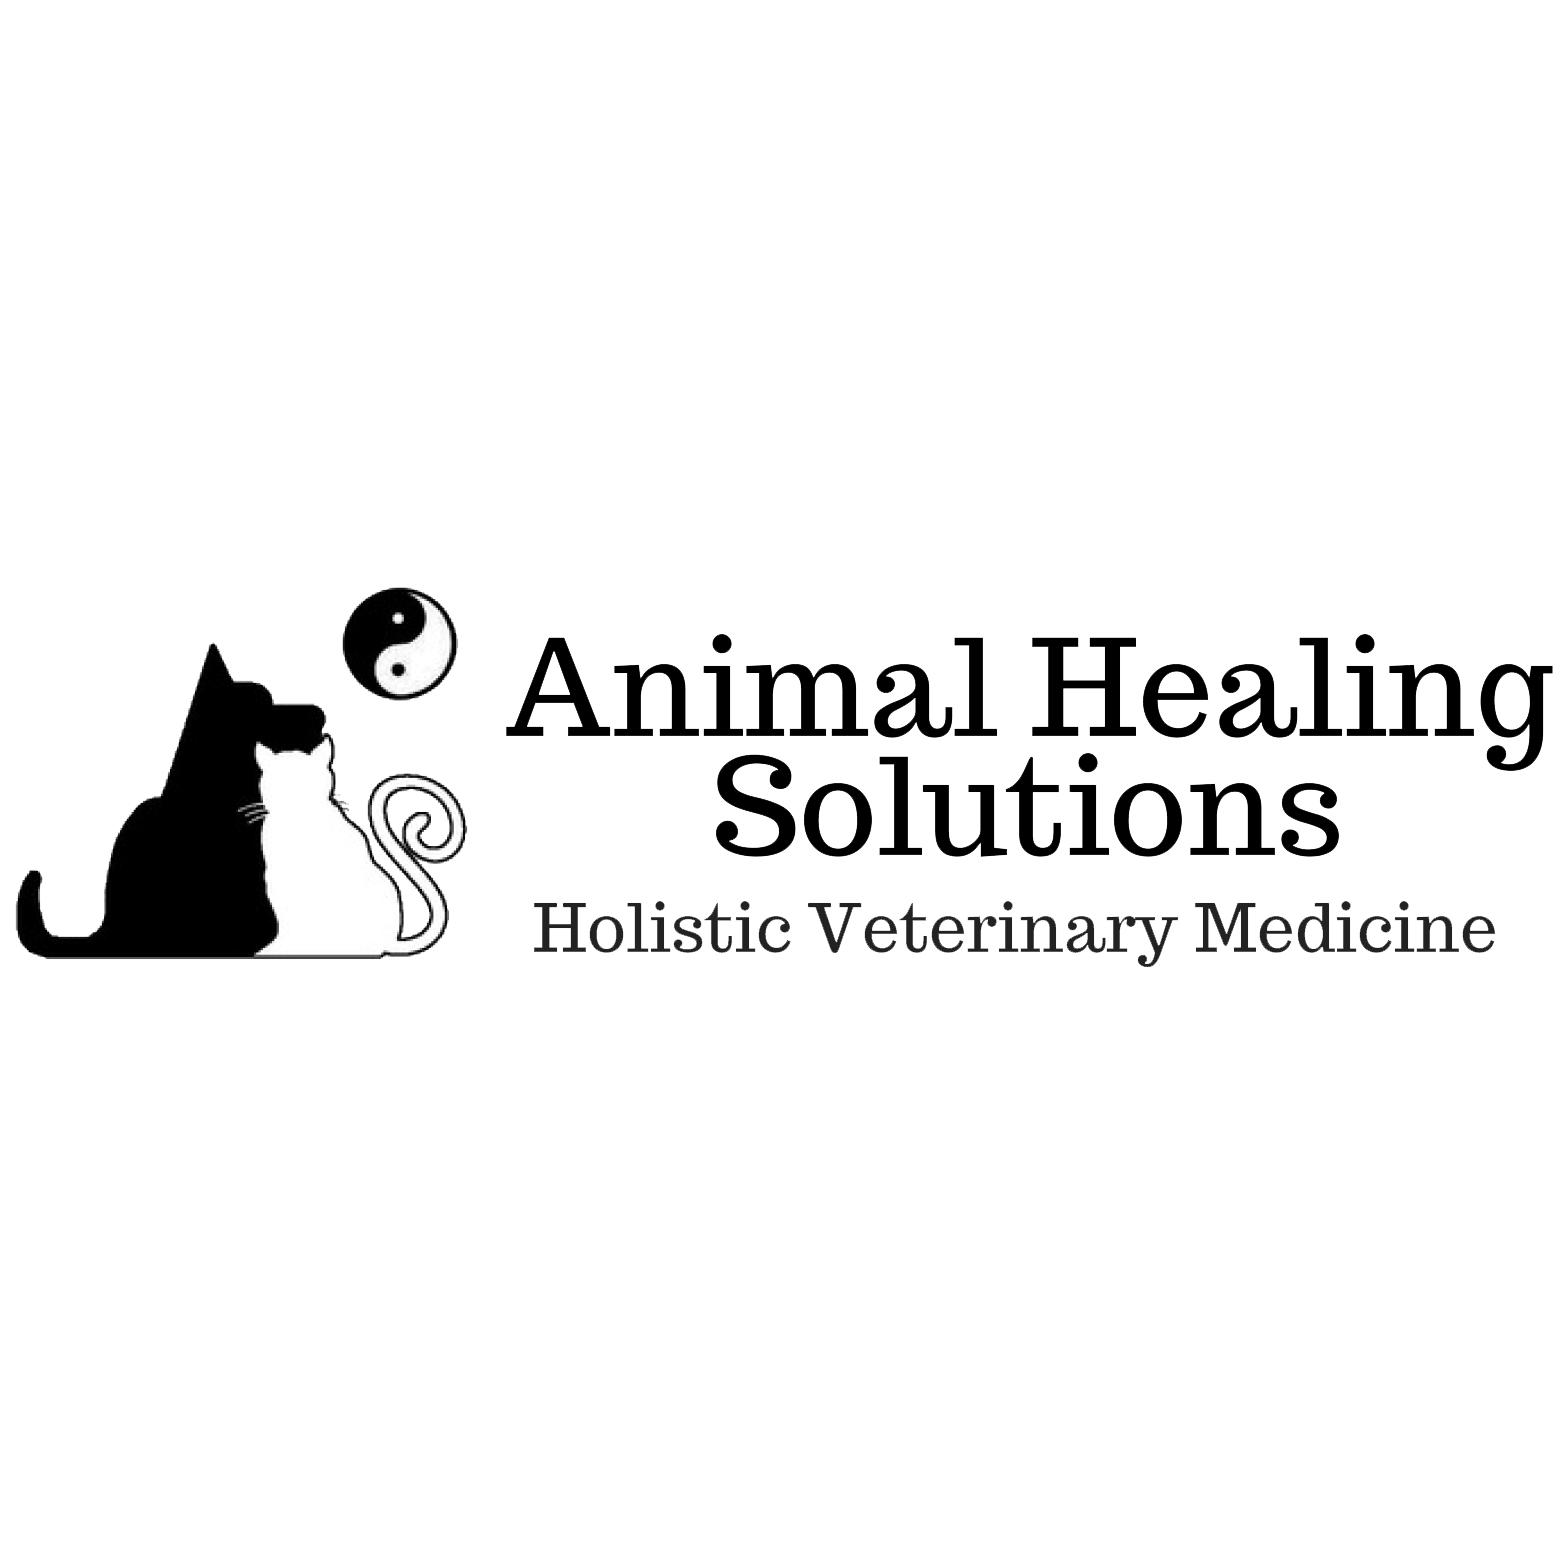 Animal Healing Solutions